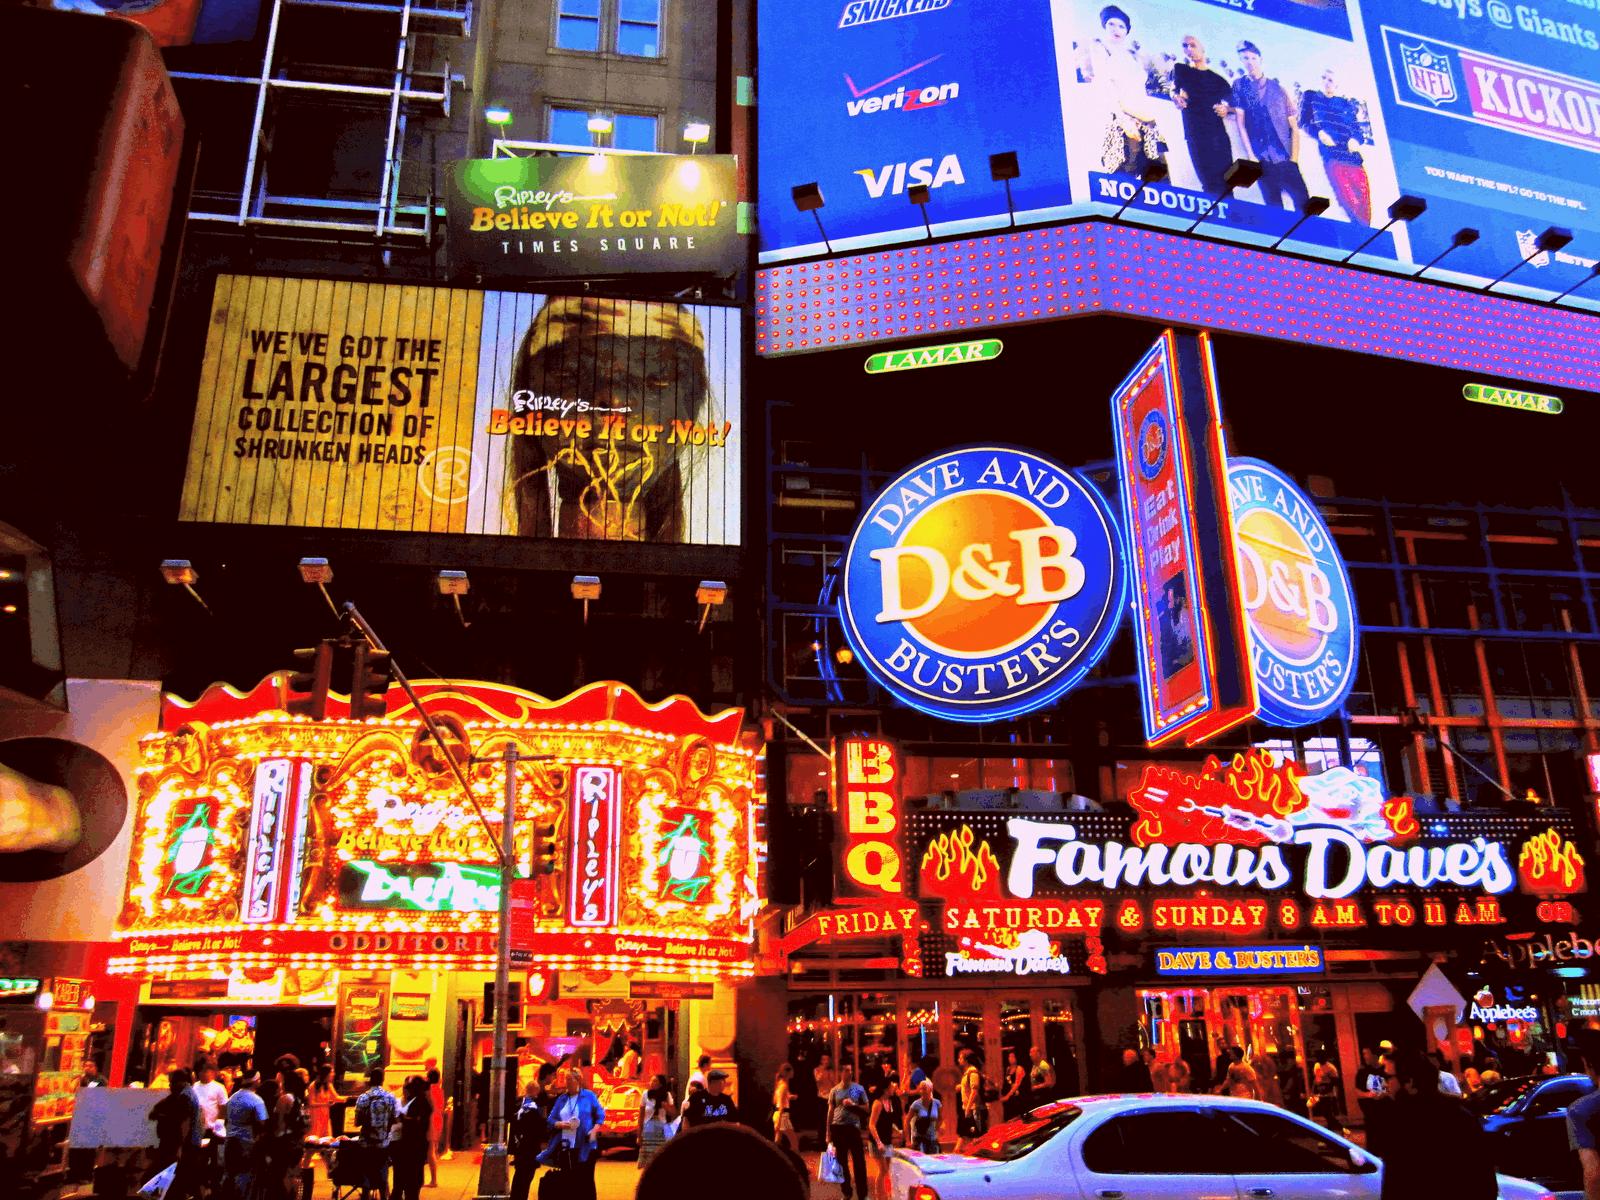 Chain Restaurants – NYC travel tip